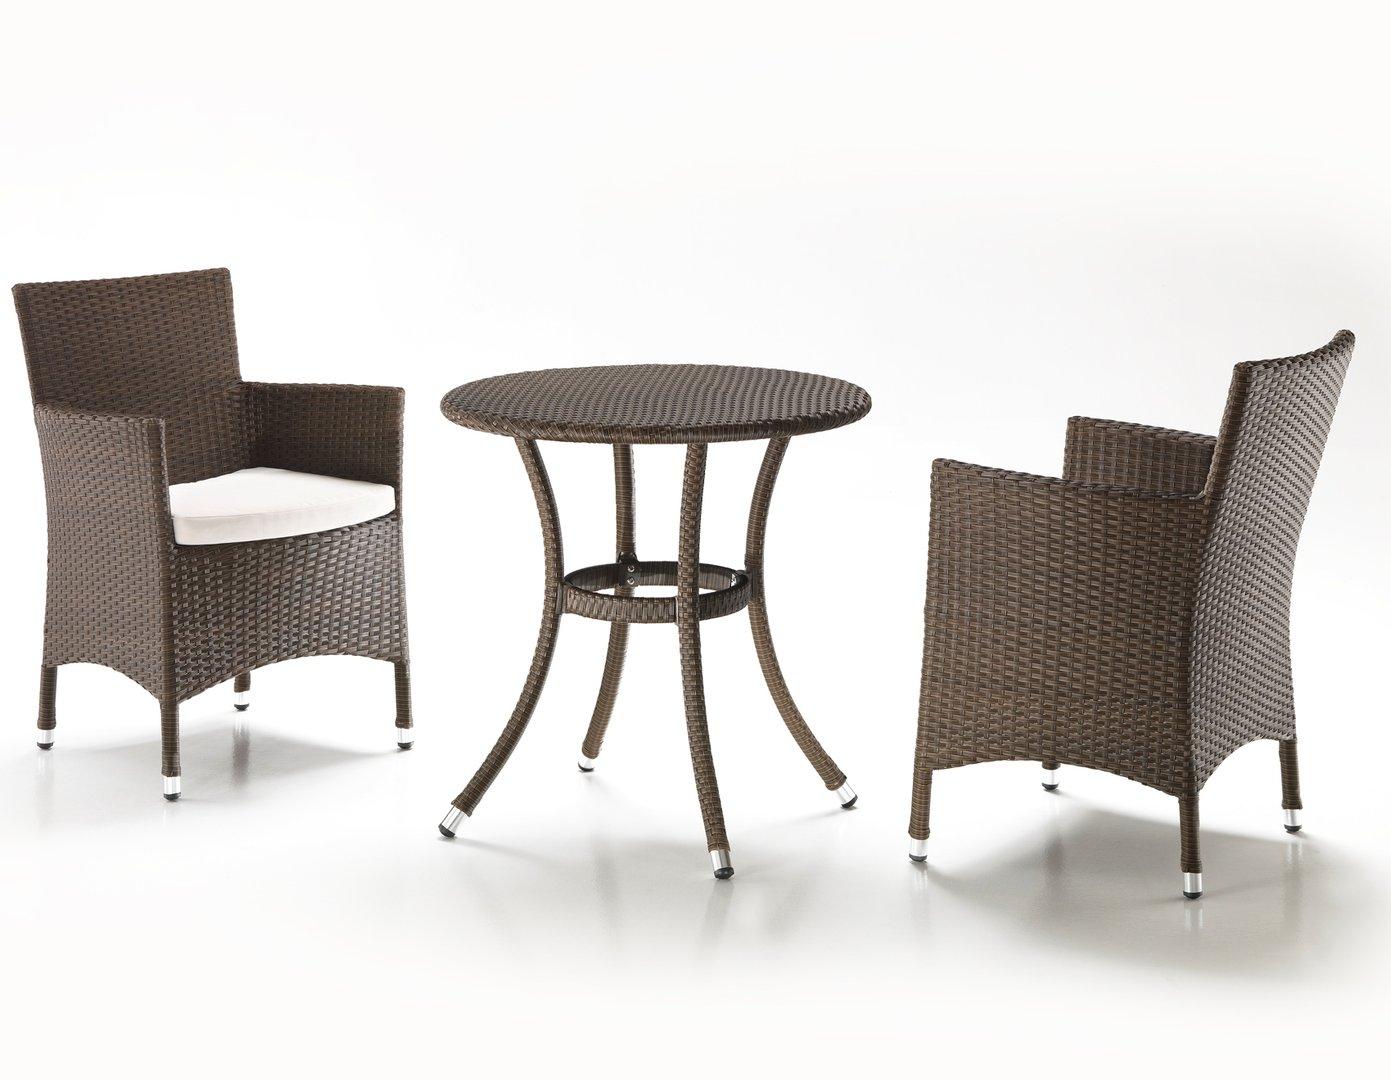 Casa moderna roma italy tavolini da bar ikea - Tavolini da esterno ikea ...